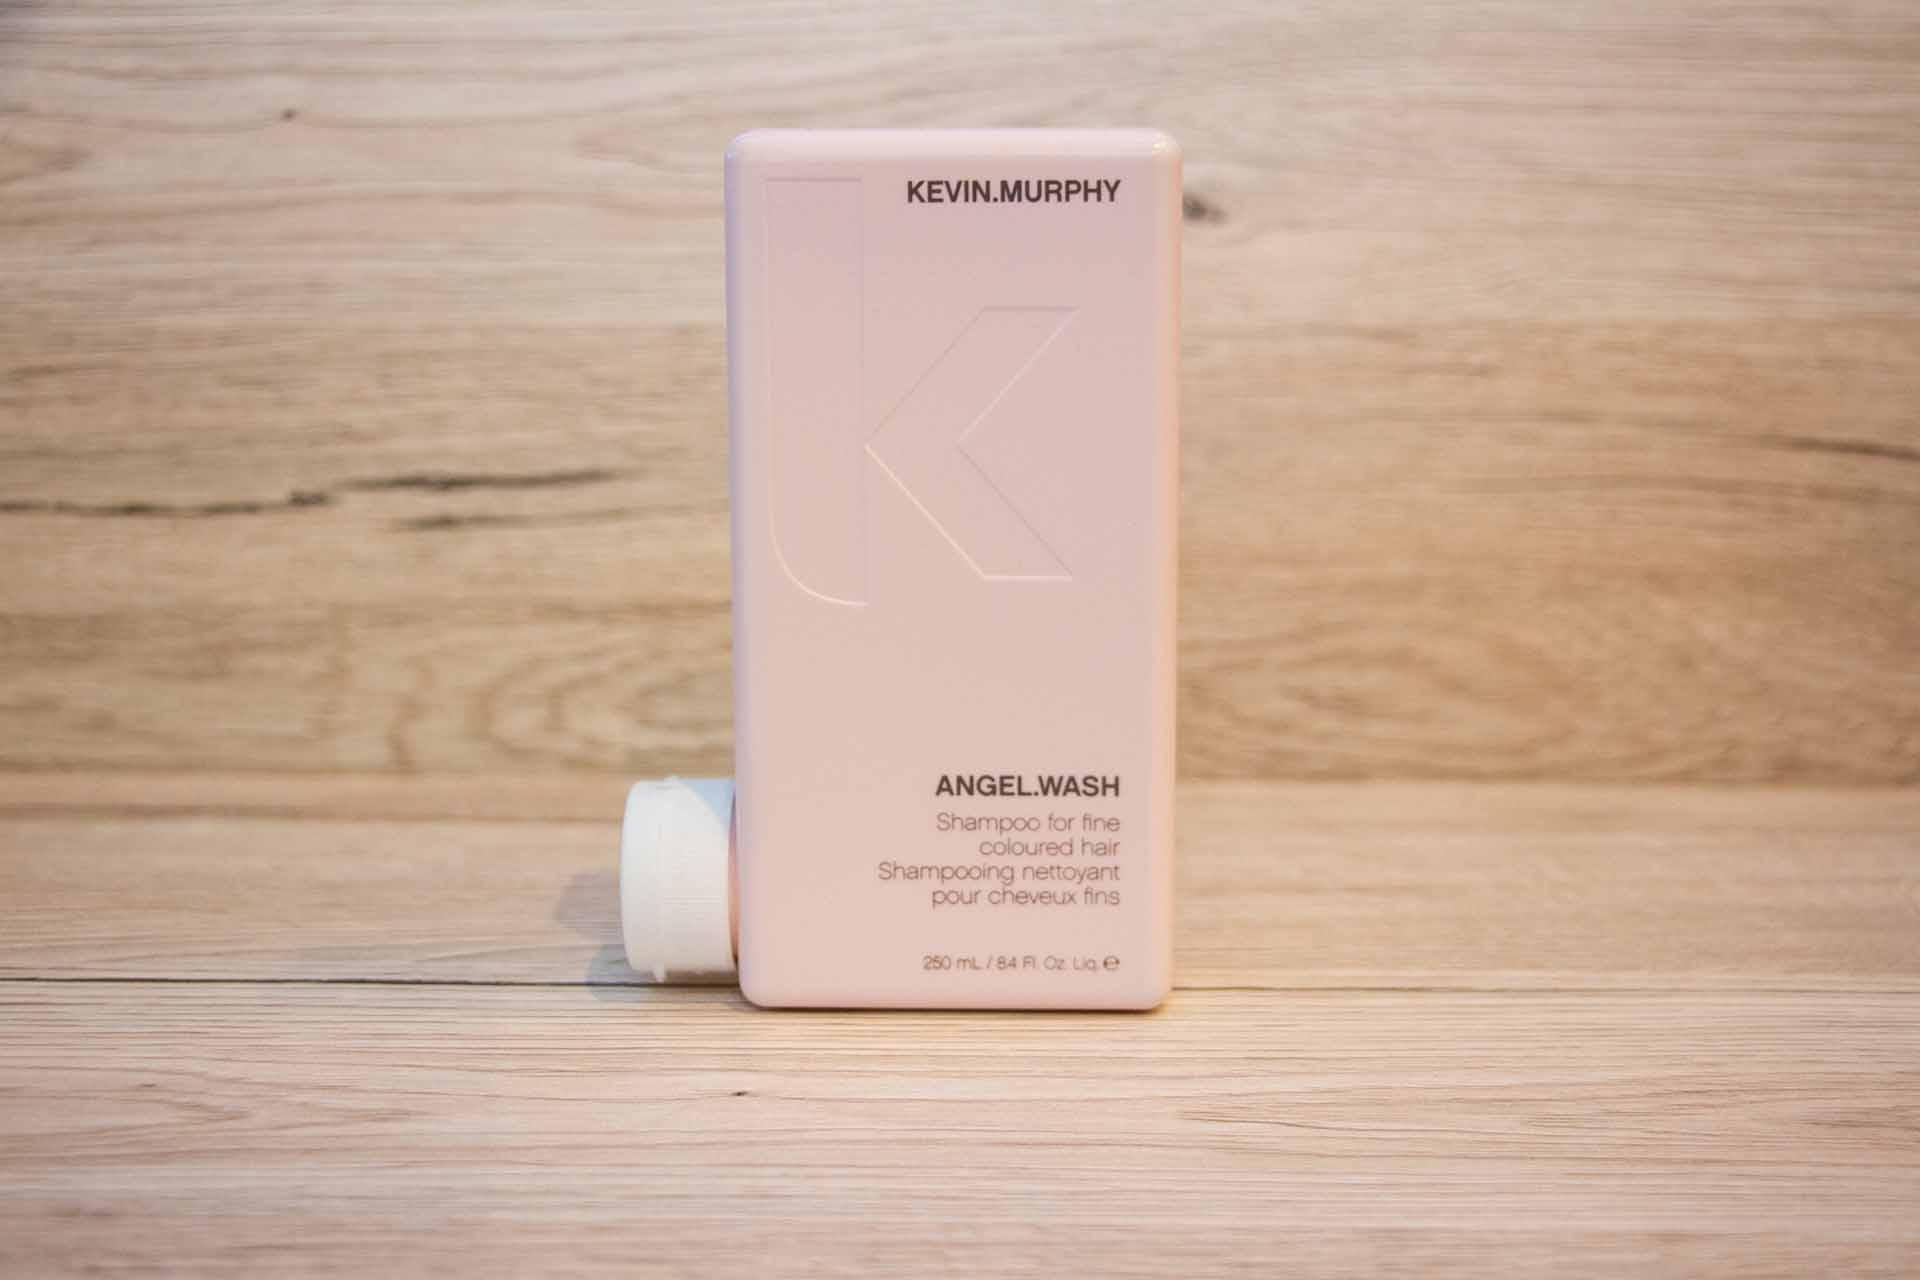 Prodotti Kevin Murphy, Angel.Wash da Diego Staff Parrucchieri Spinea